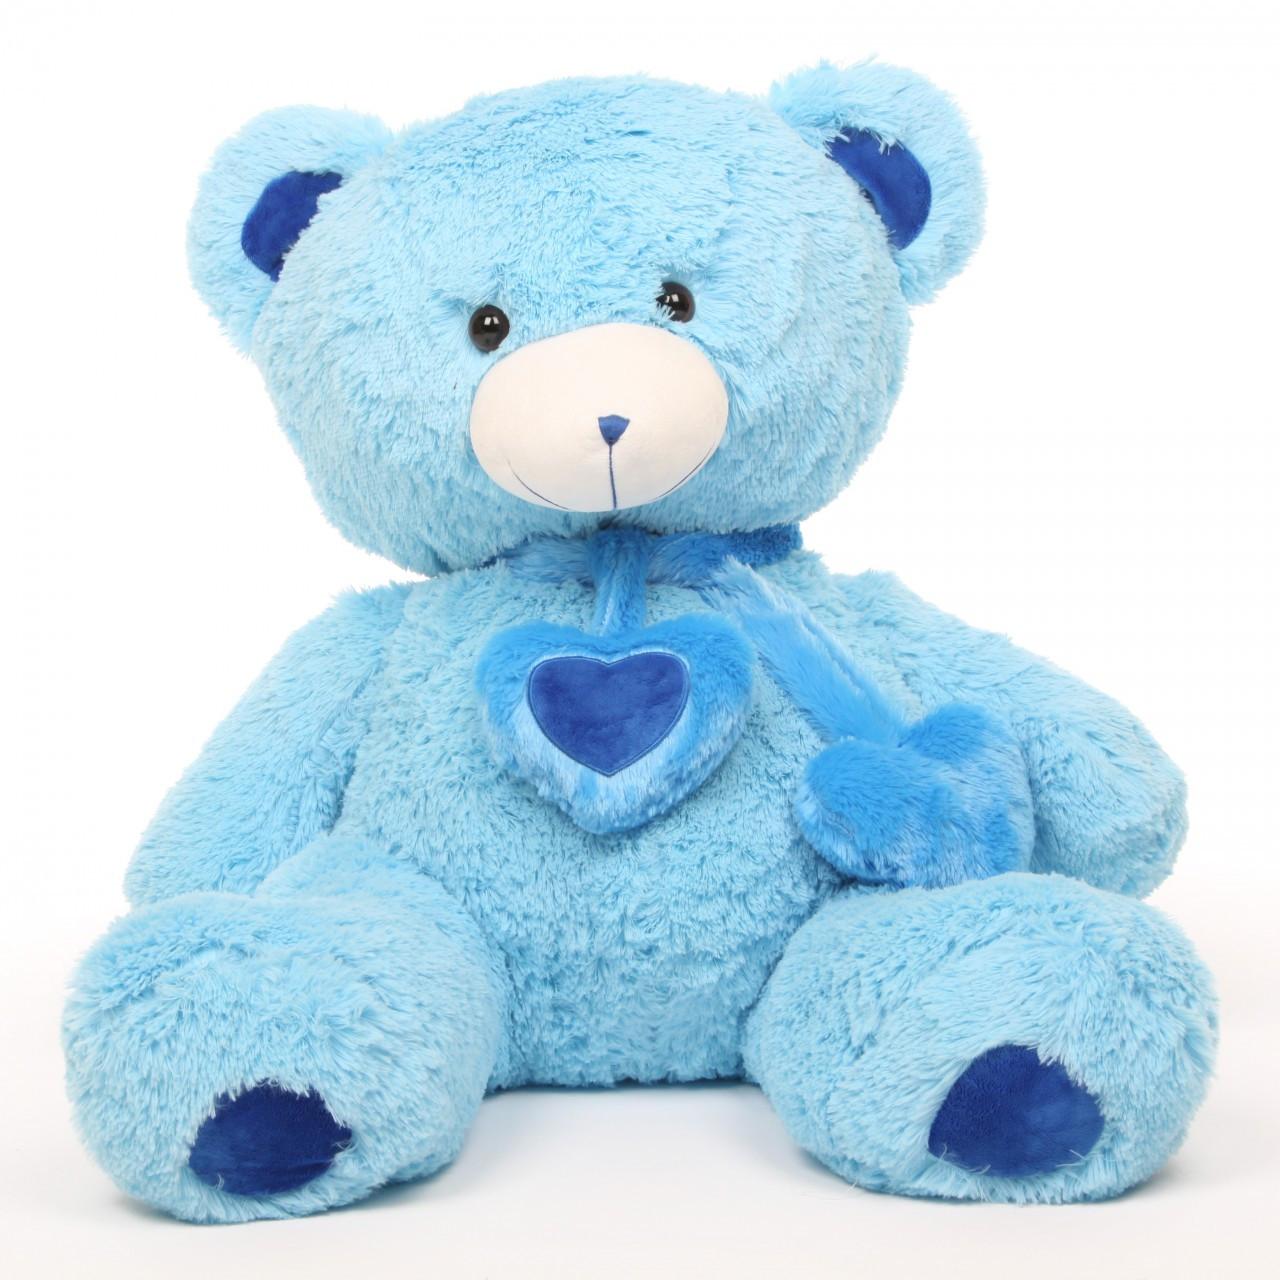 shorty hugs 36 blue cute big stuffed teddy bear giant teddy bears